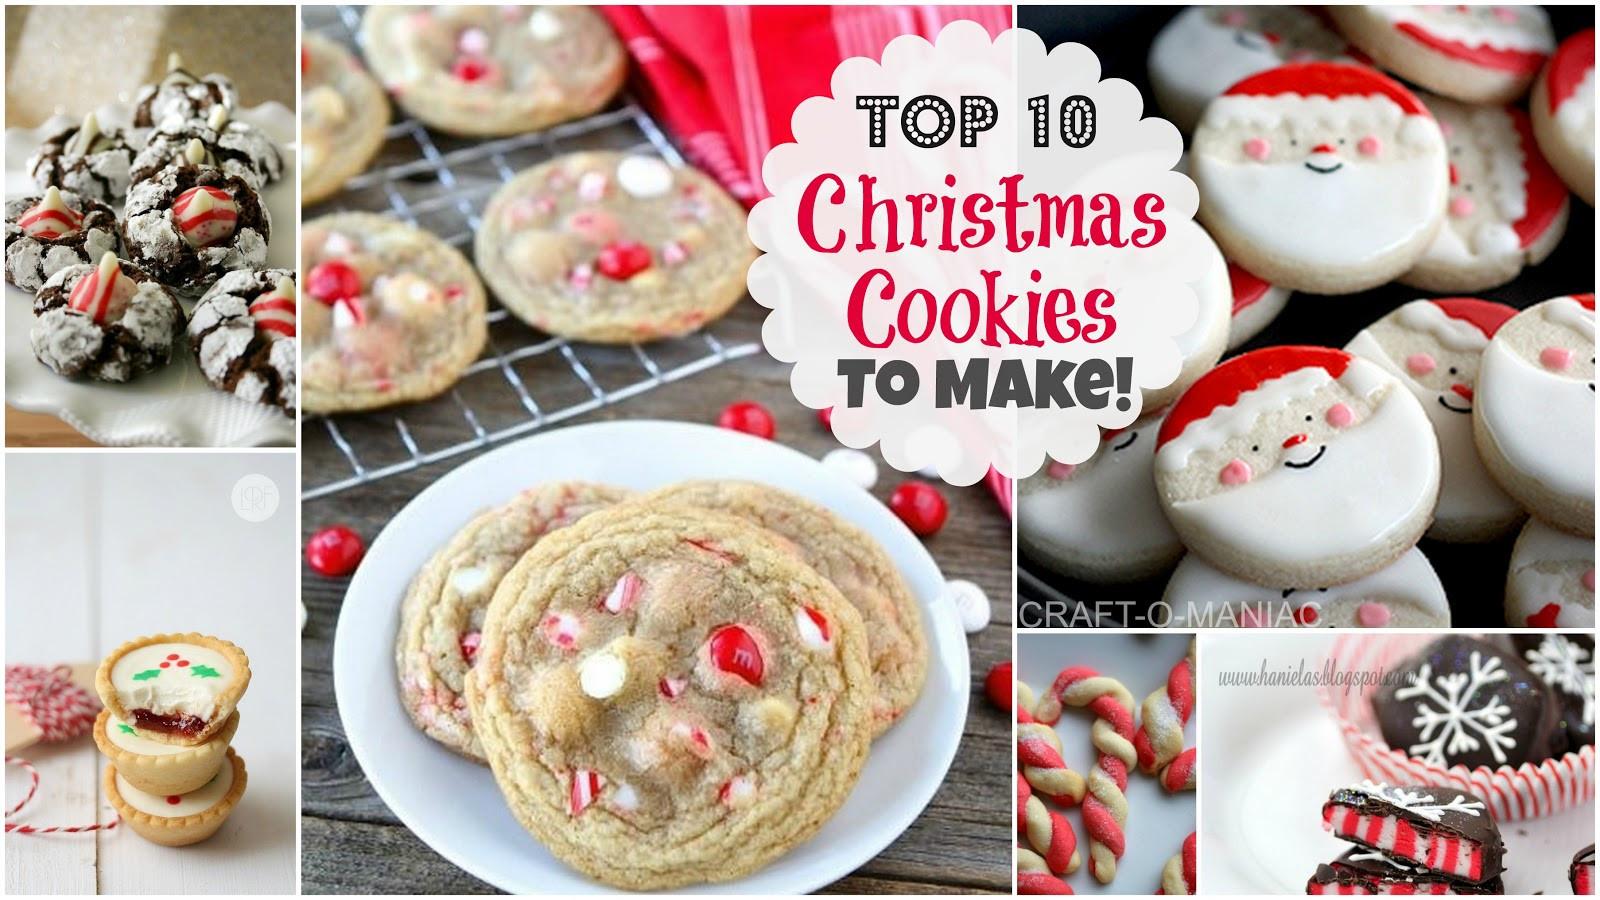 Great Christmas Cookies  Top 10 Christmas Cookies to Make Craft O Maniac